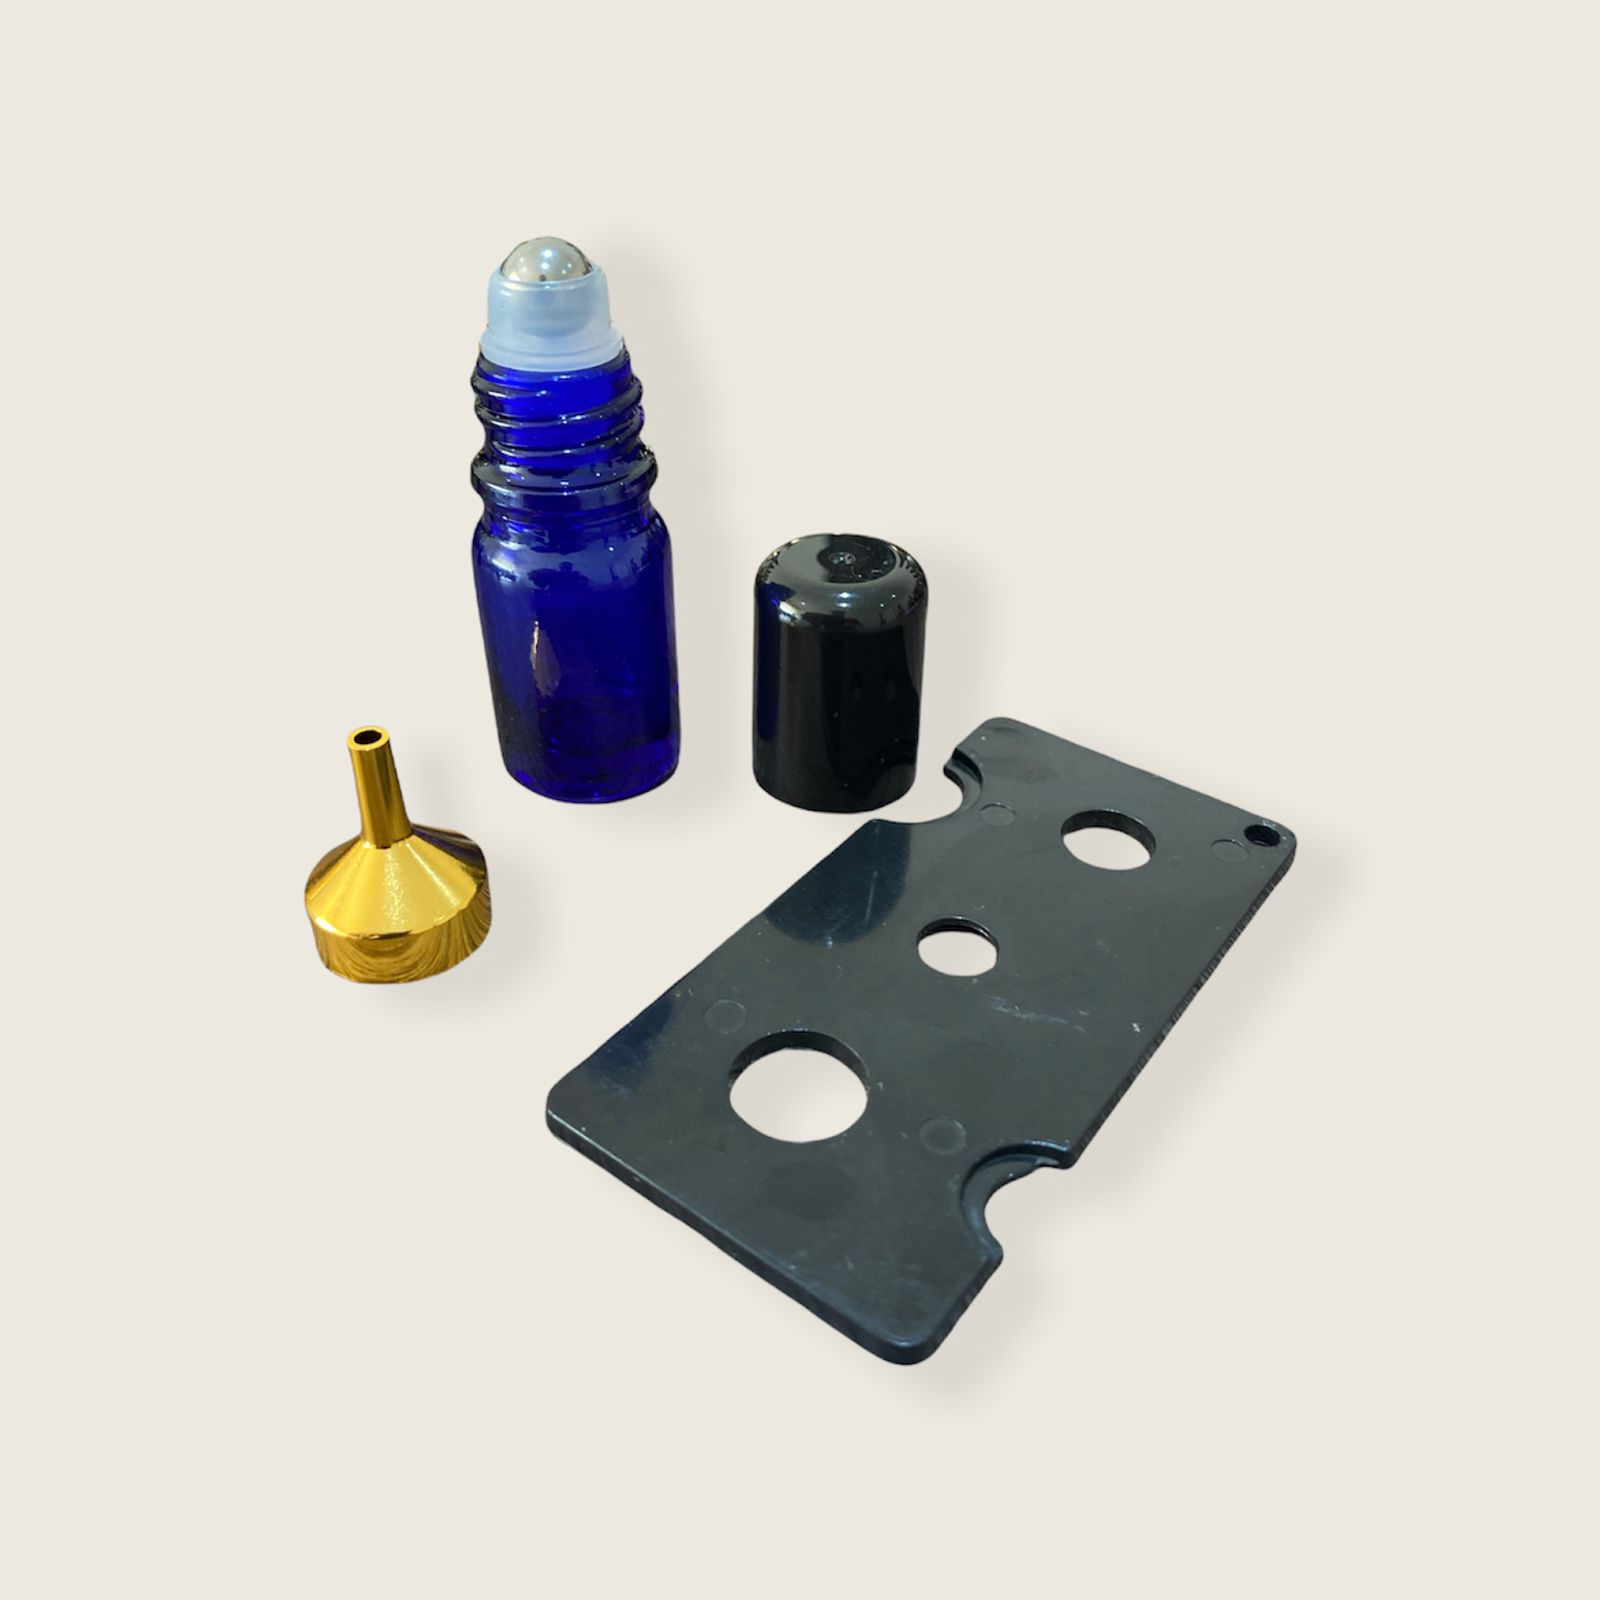 05 Frascos Vidro Âmbar Rollon 5ml Premium Azul 1 Funil Metal e 1 Abridor